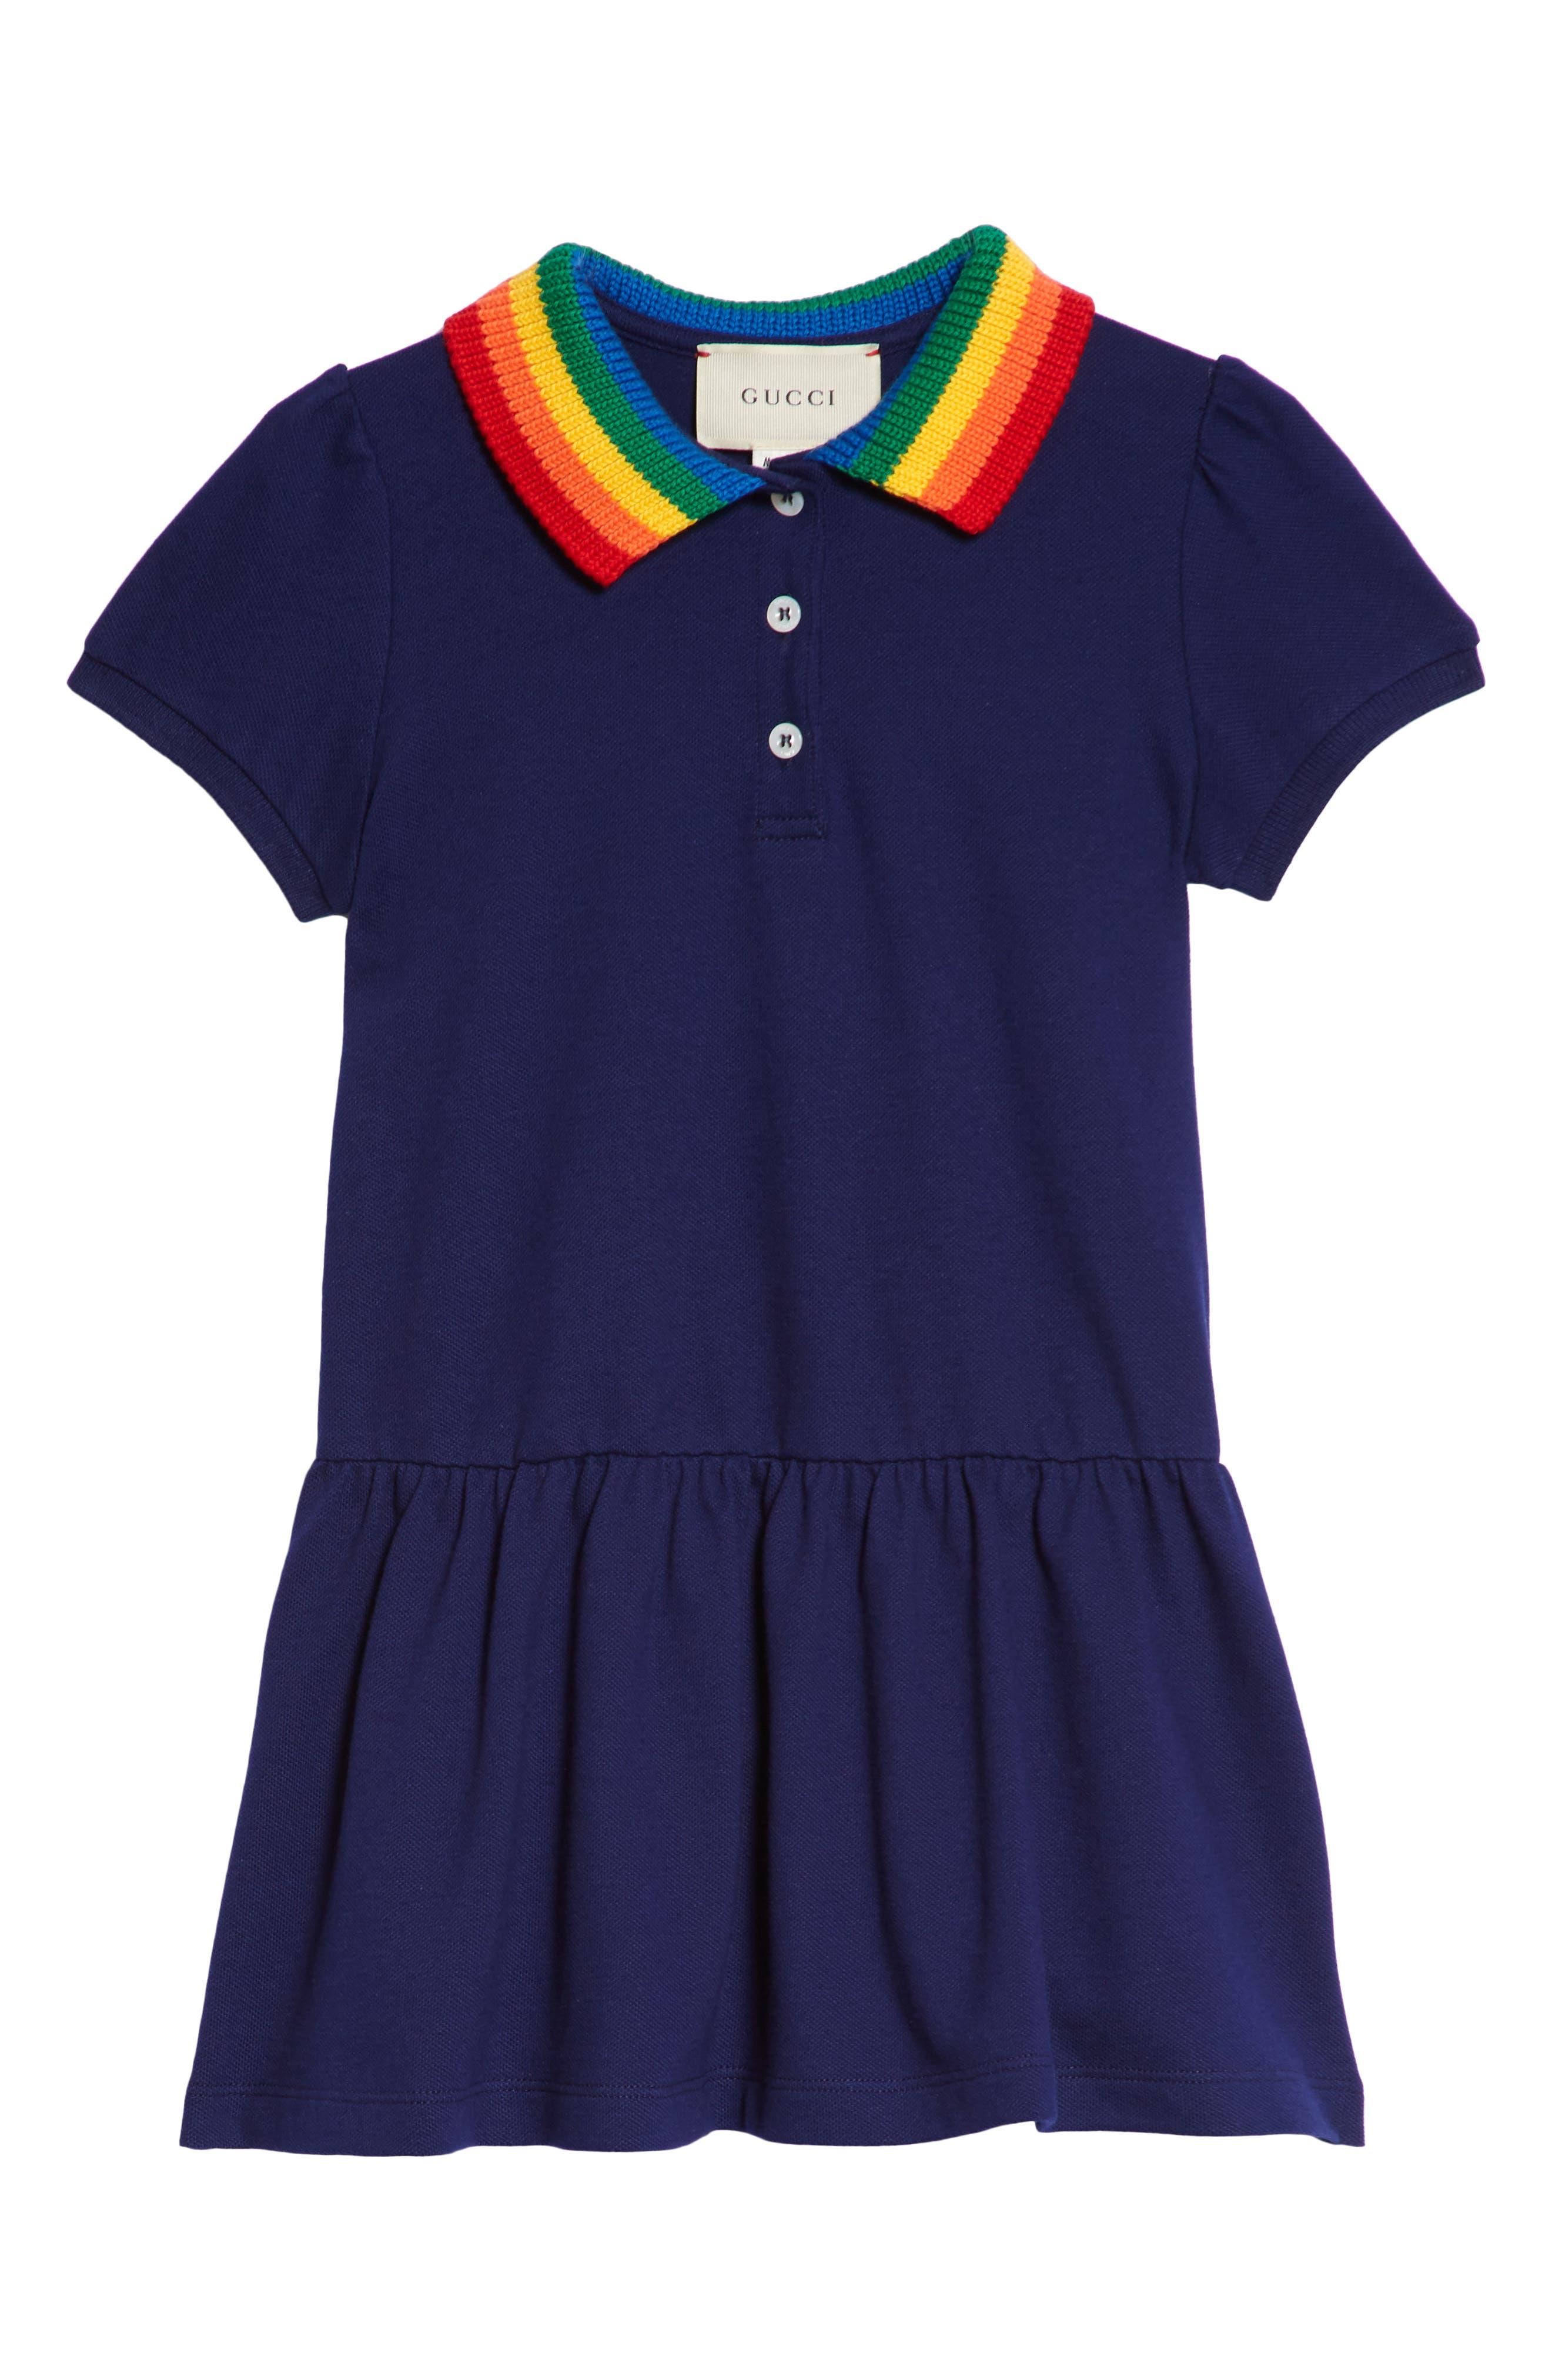 e532367f023 Girls Gucci Clothes (Sizes 2T-6X) Dresses